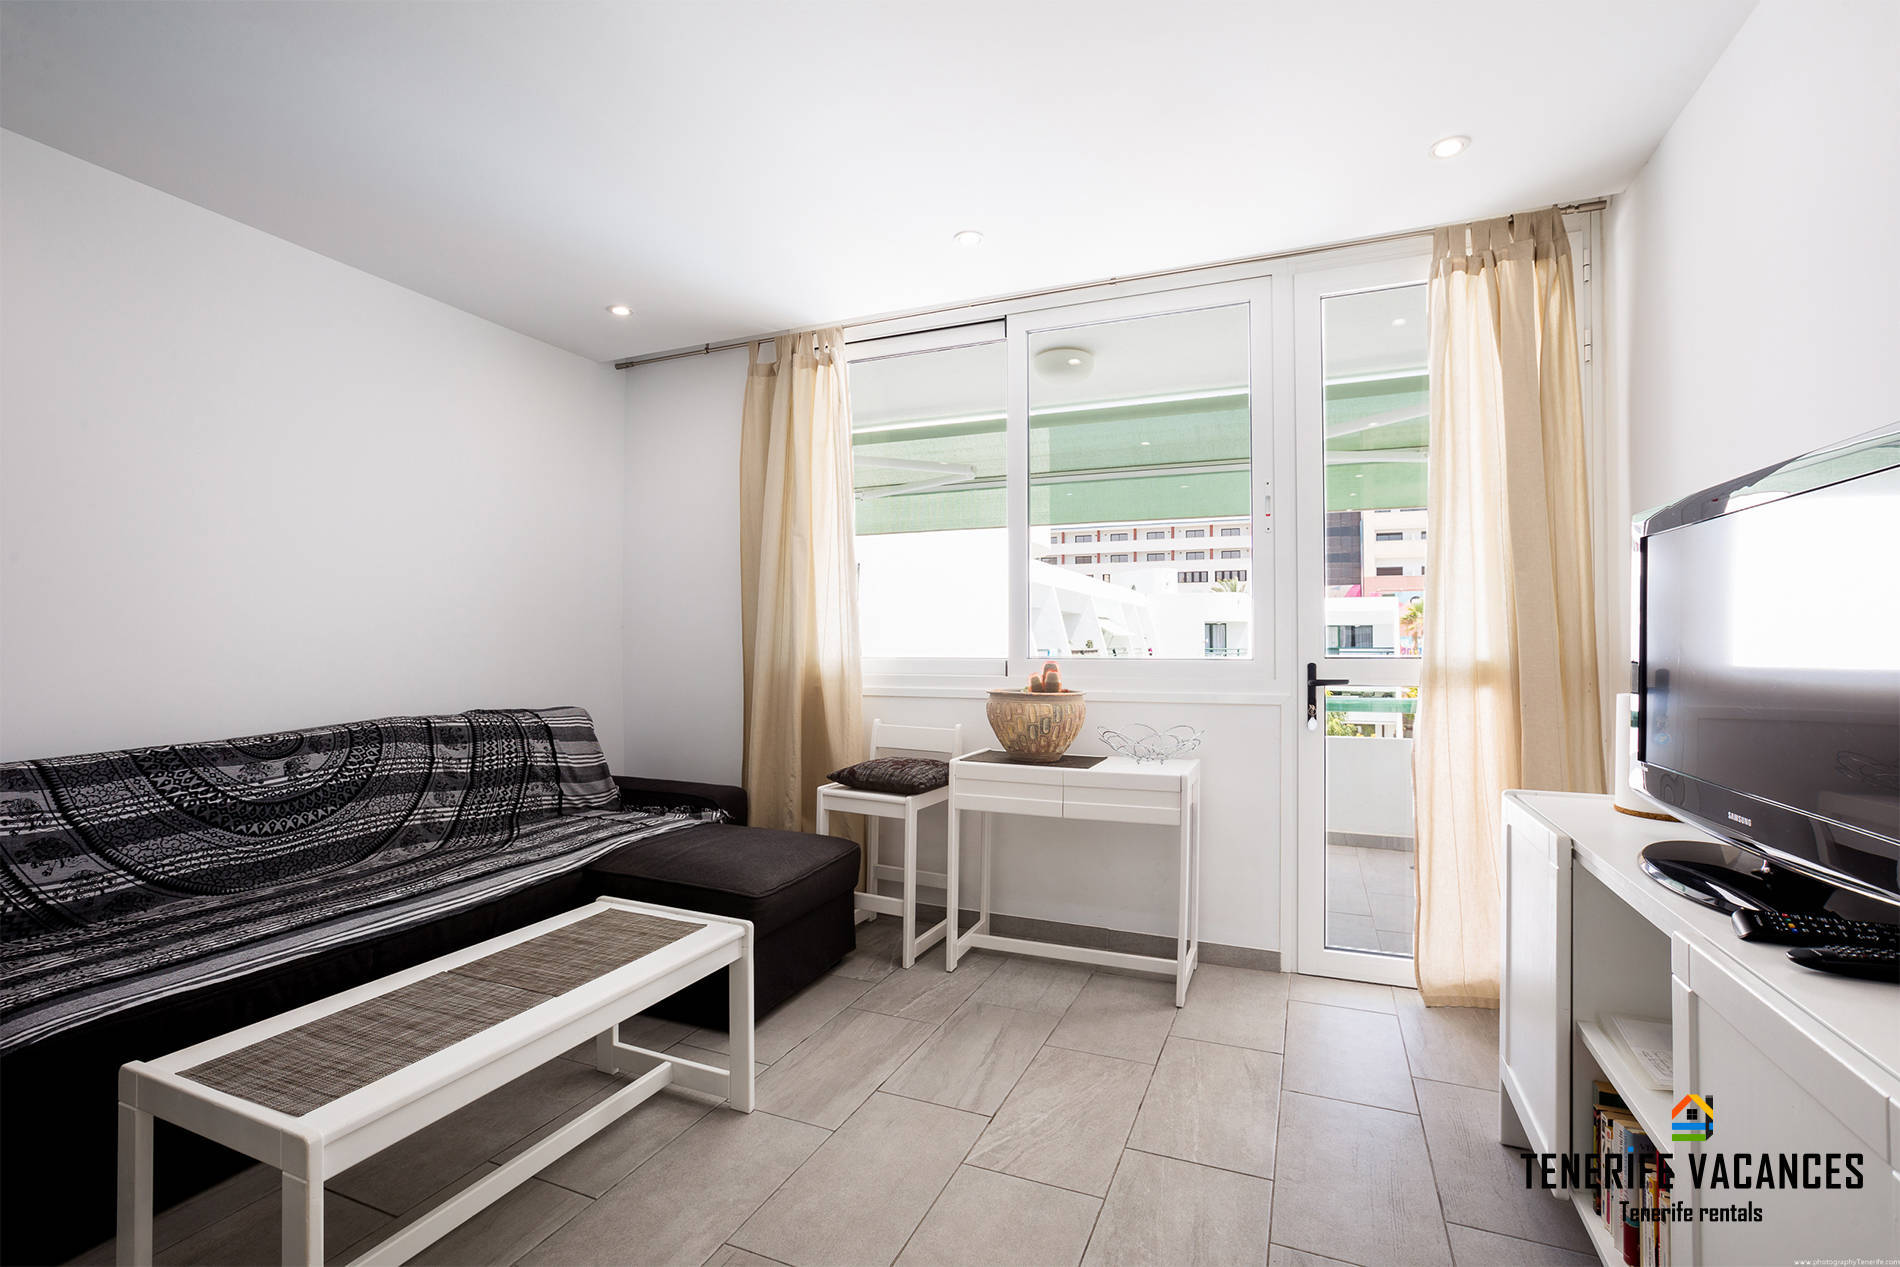 apartamento 1 dormitorio optimist tlv13 Tenerife Vacances 2019 1 11